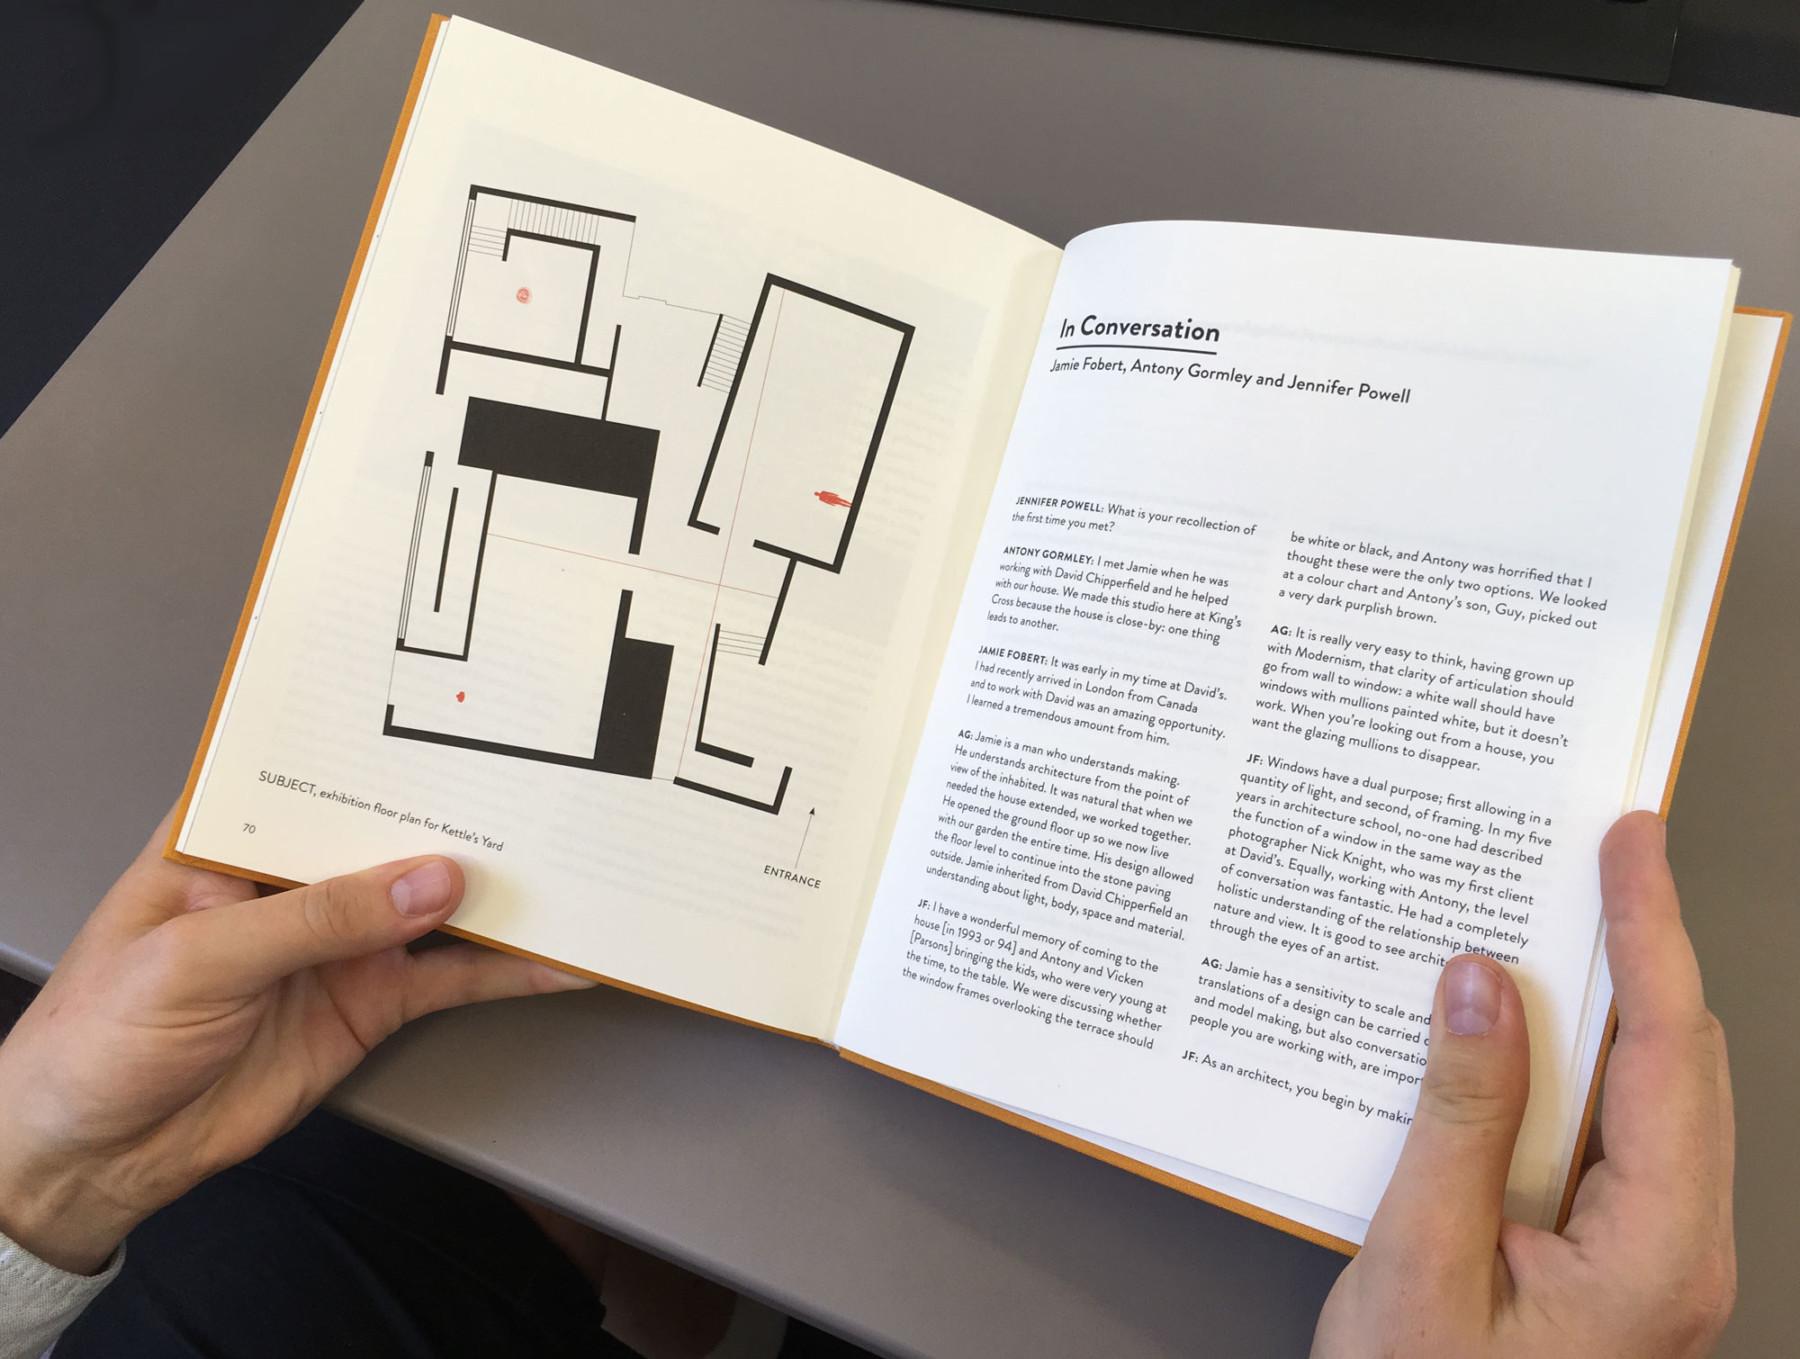 jamie-fobert-architects-antony-gormley-kettles-yard-subject-art-sculpture-architecture